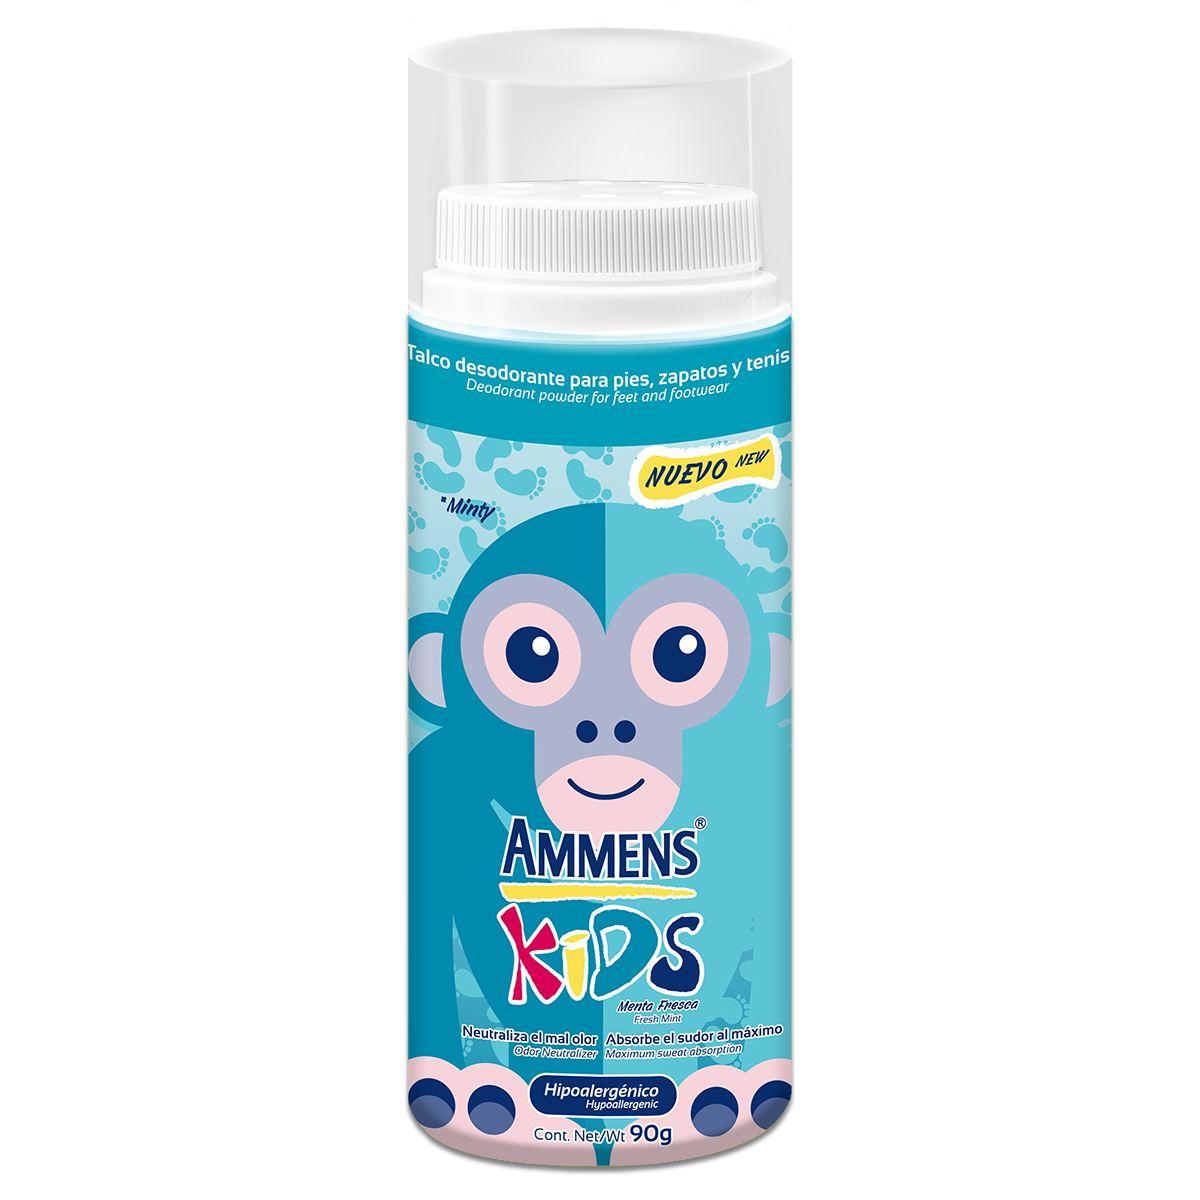 Talco Desodorante Para Pies Ammens Kids Menta Fresca 90gr